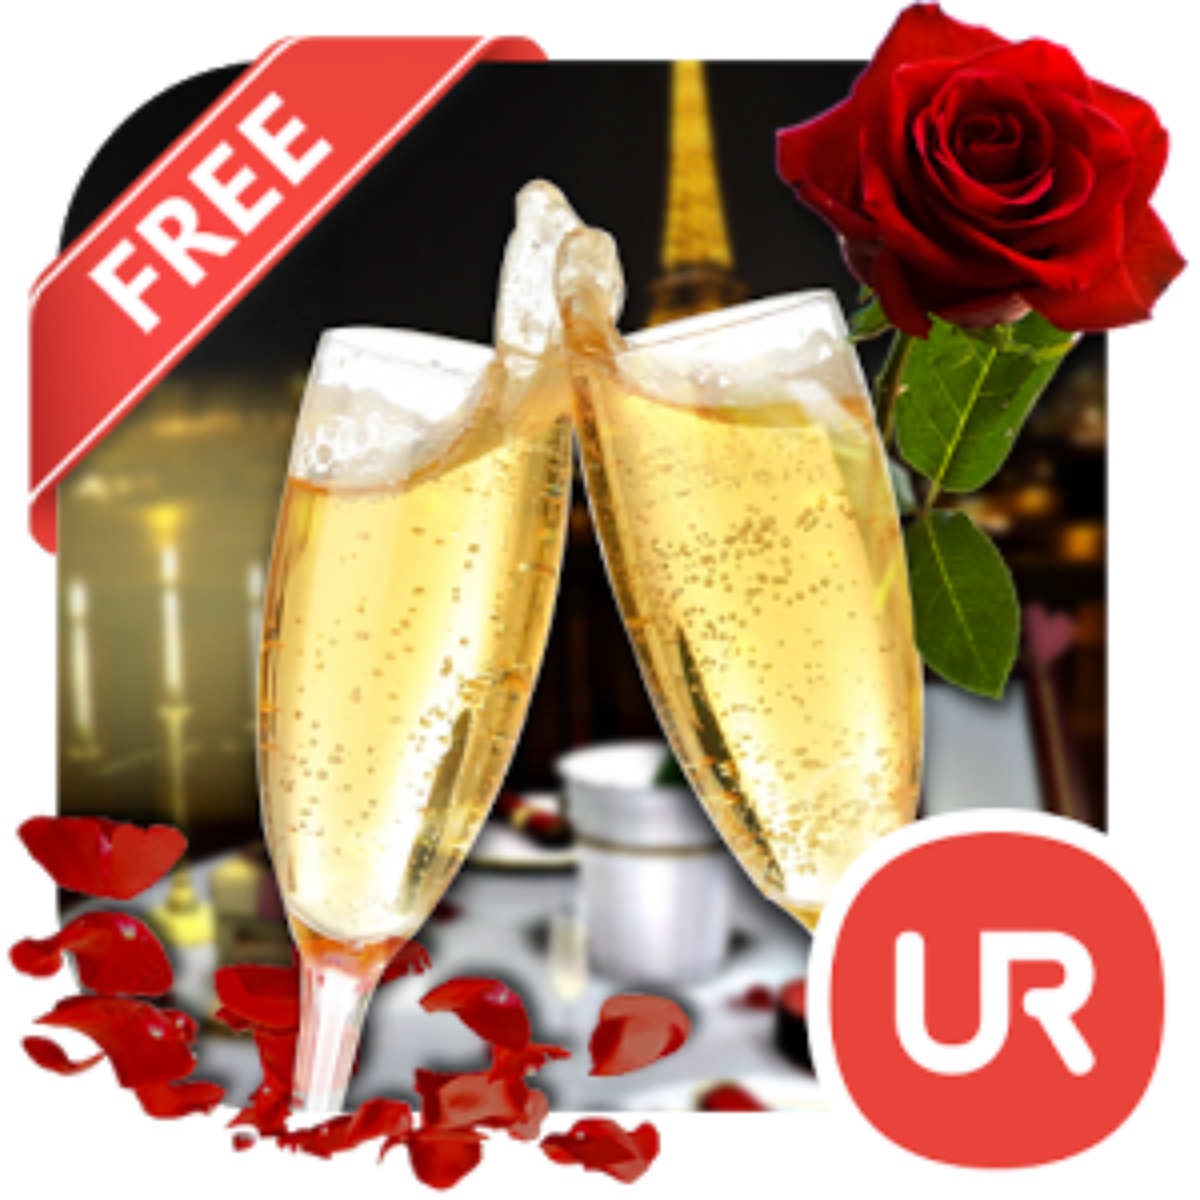 UR 3D Romantic Date Wallpaper